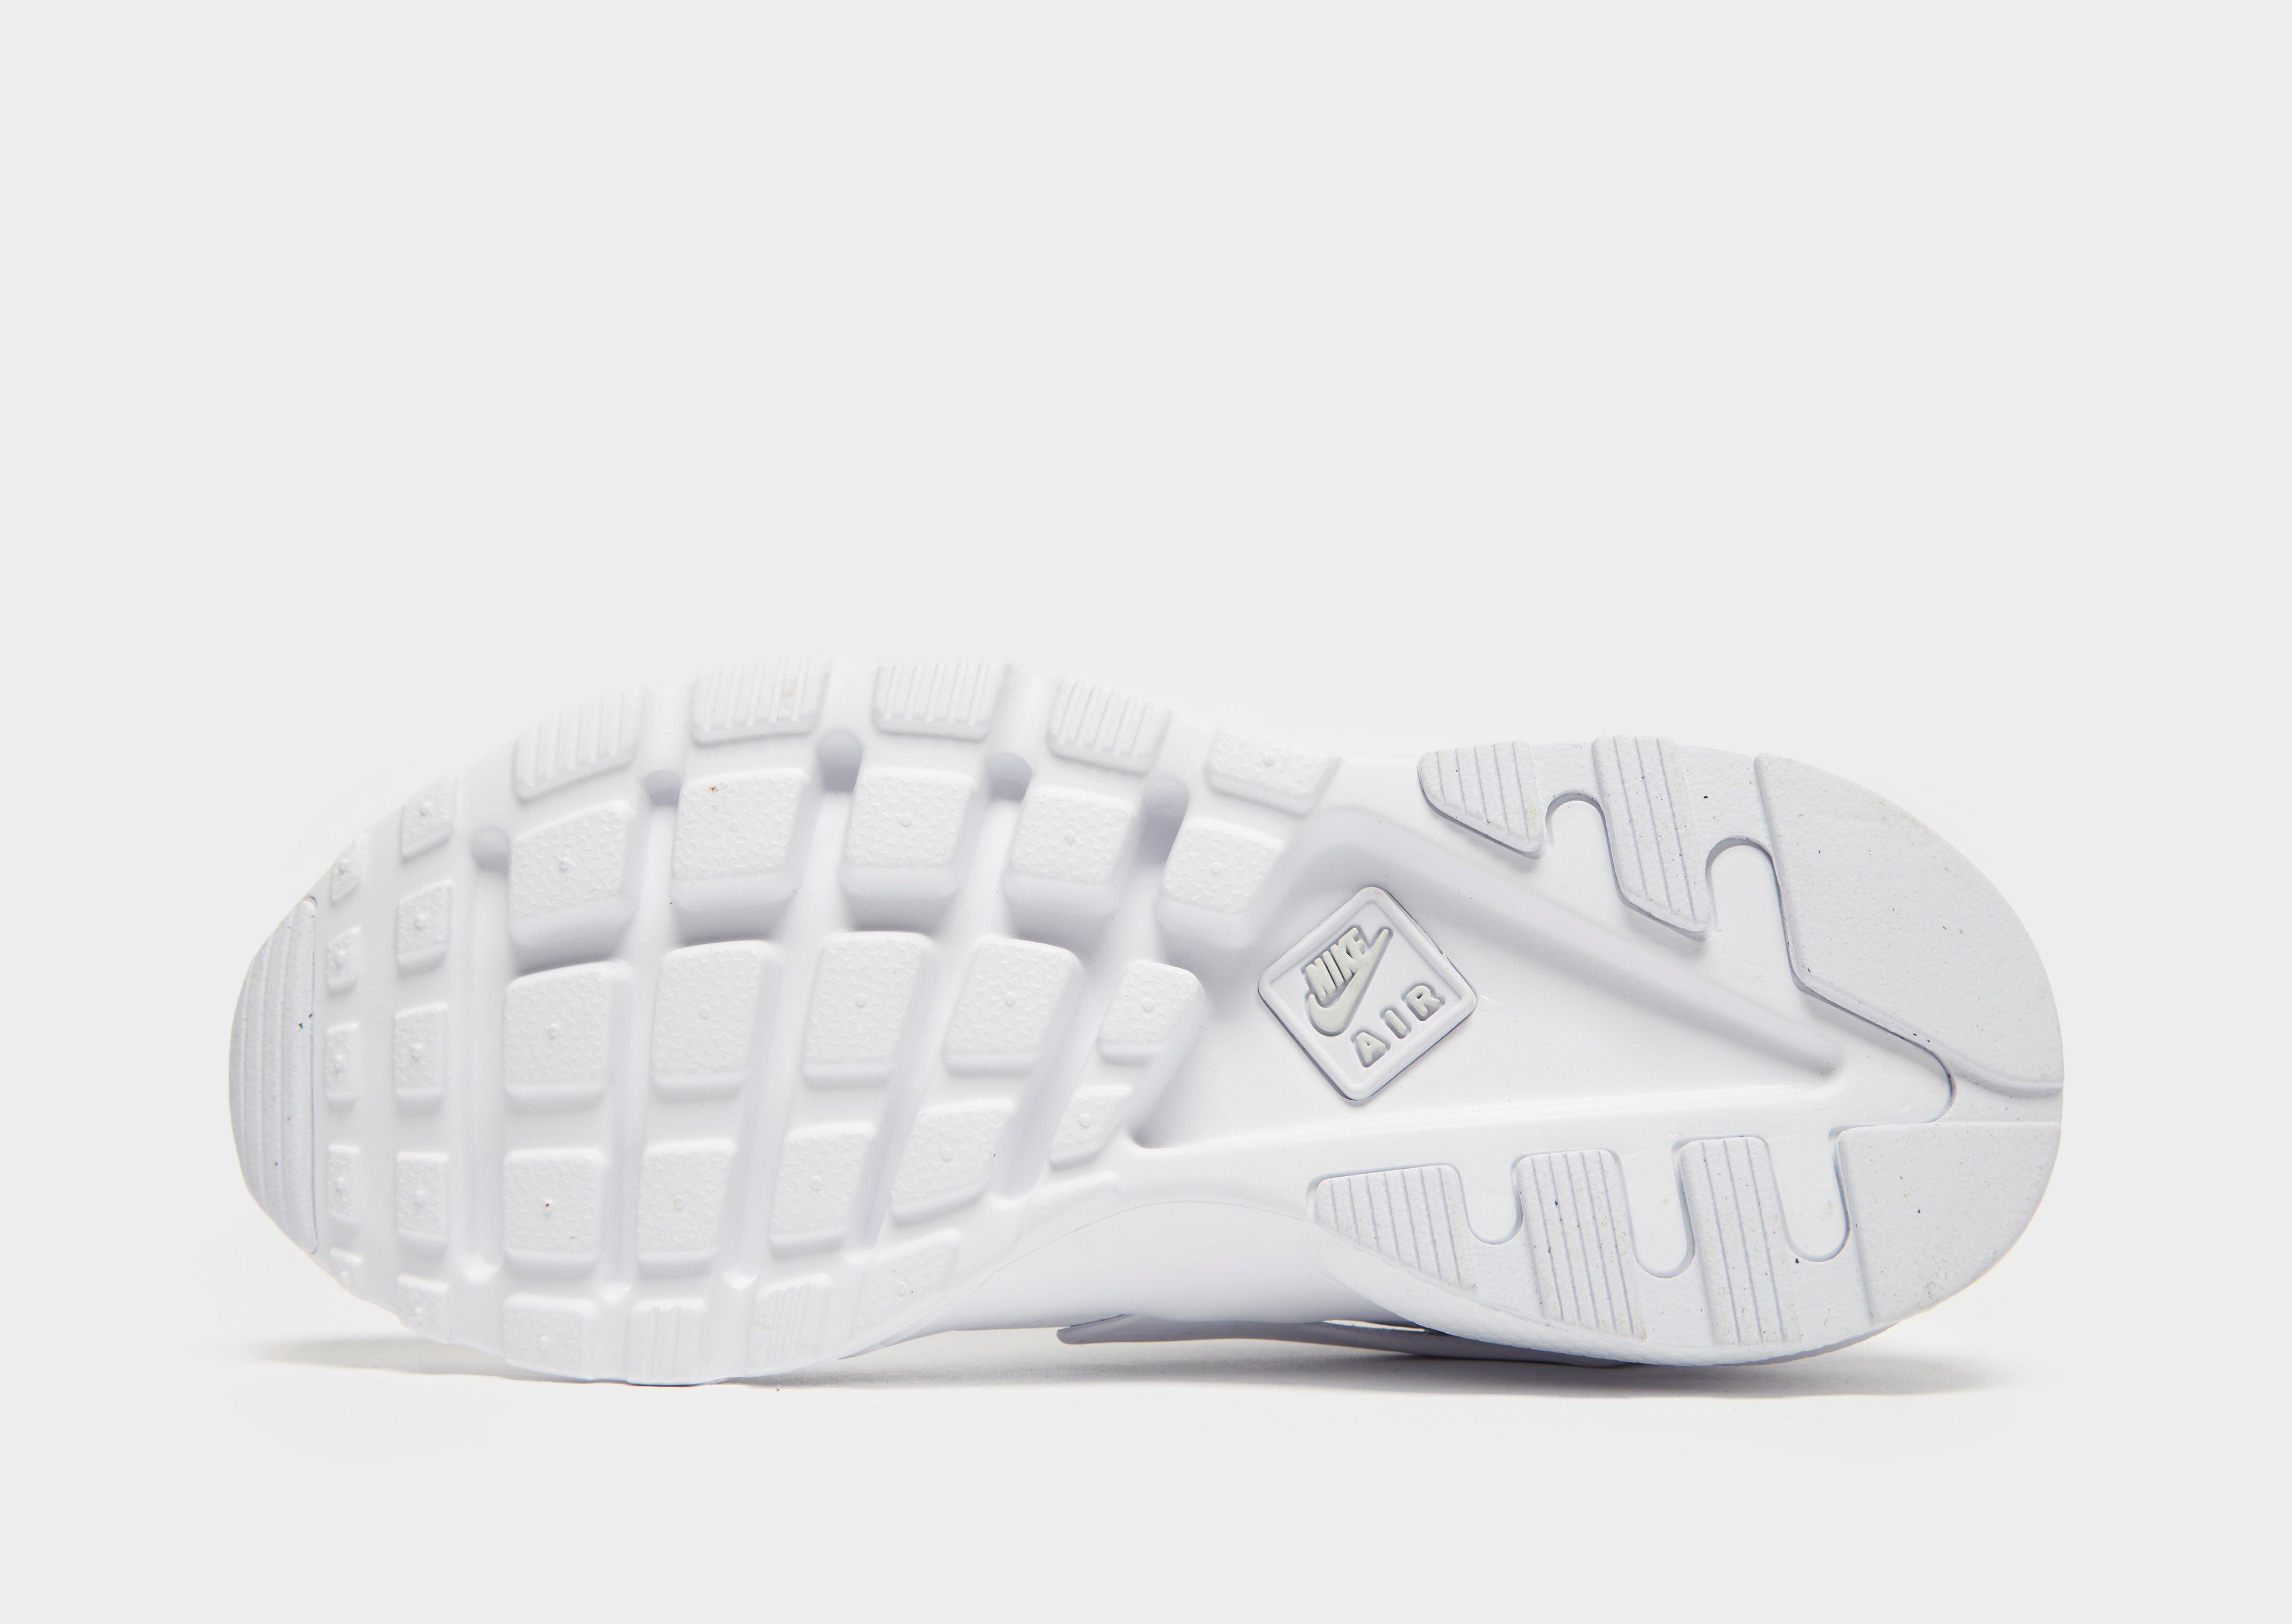 716e3eb3 Nike Zoom Vapor 9.5 Mint Bright Shoes   HopShopGo